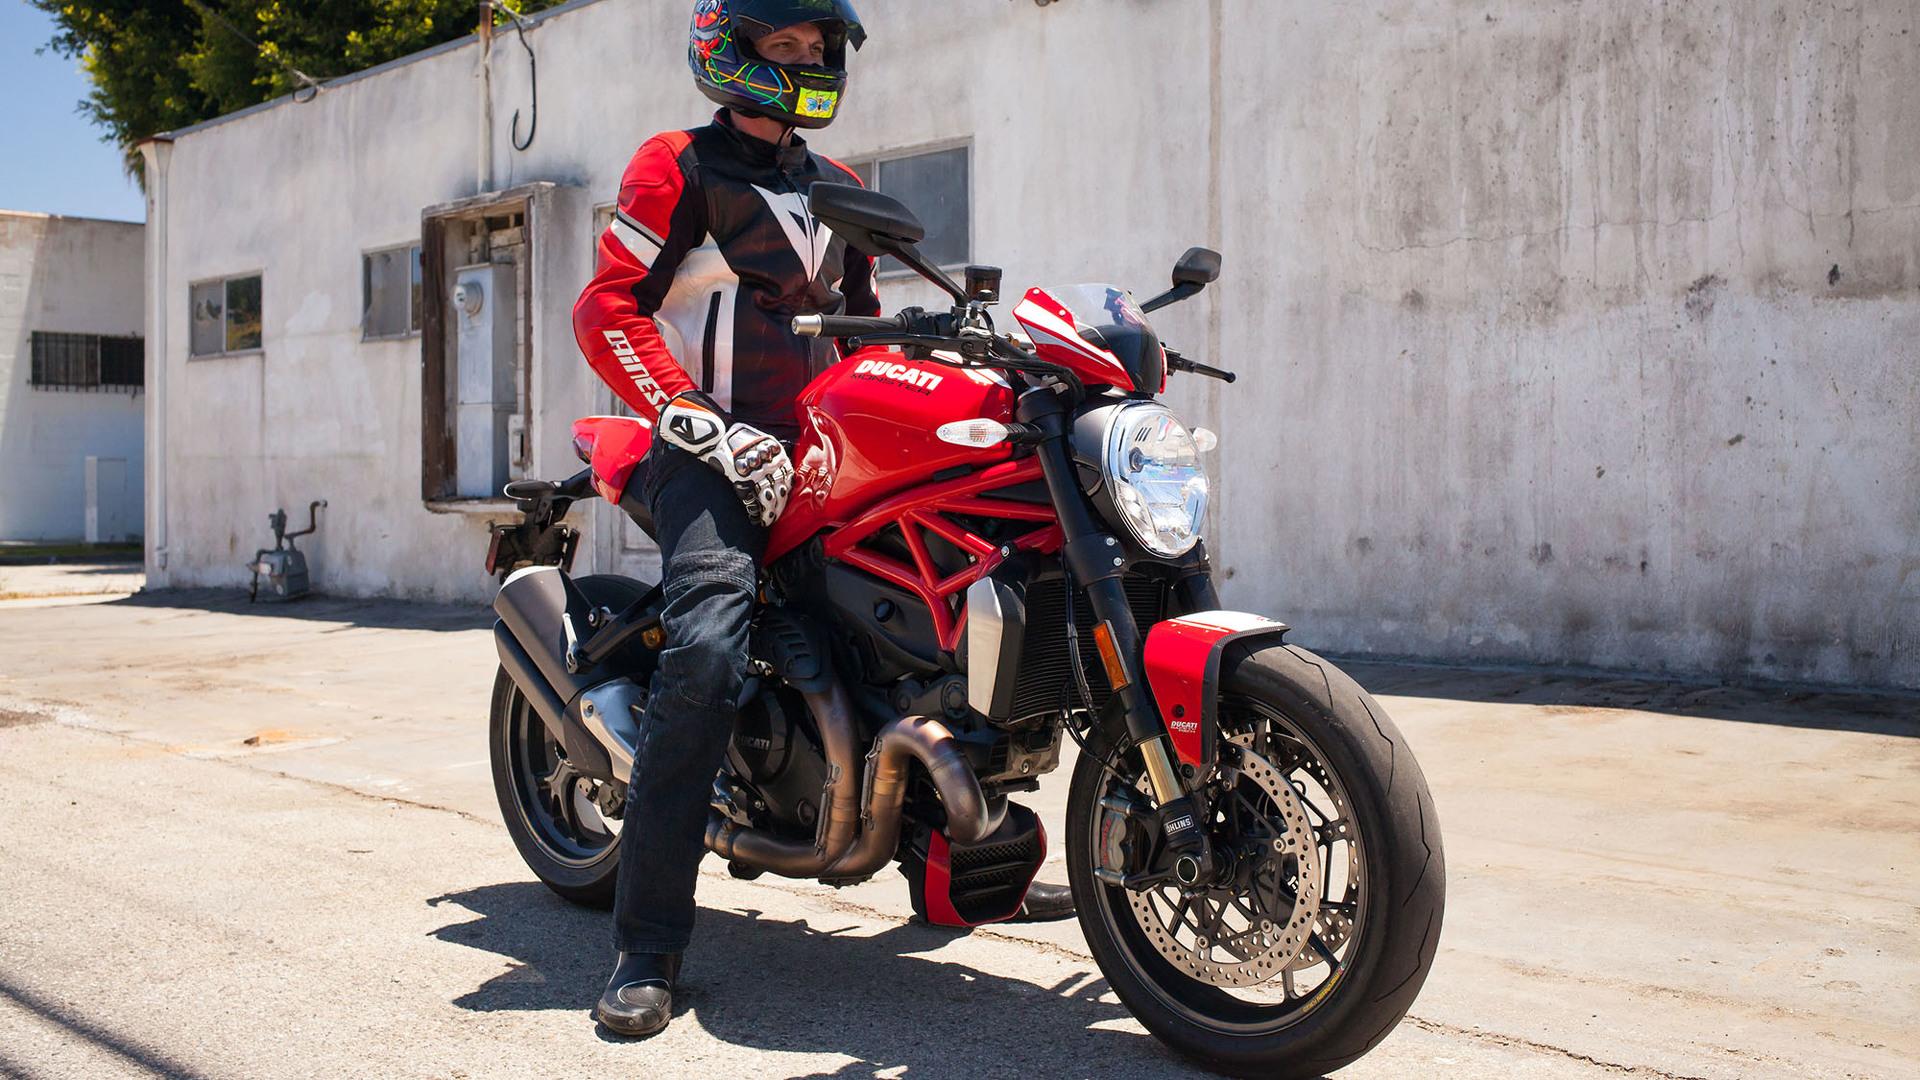 Ducati Ecu Tuning